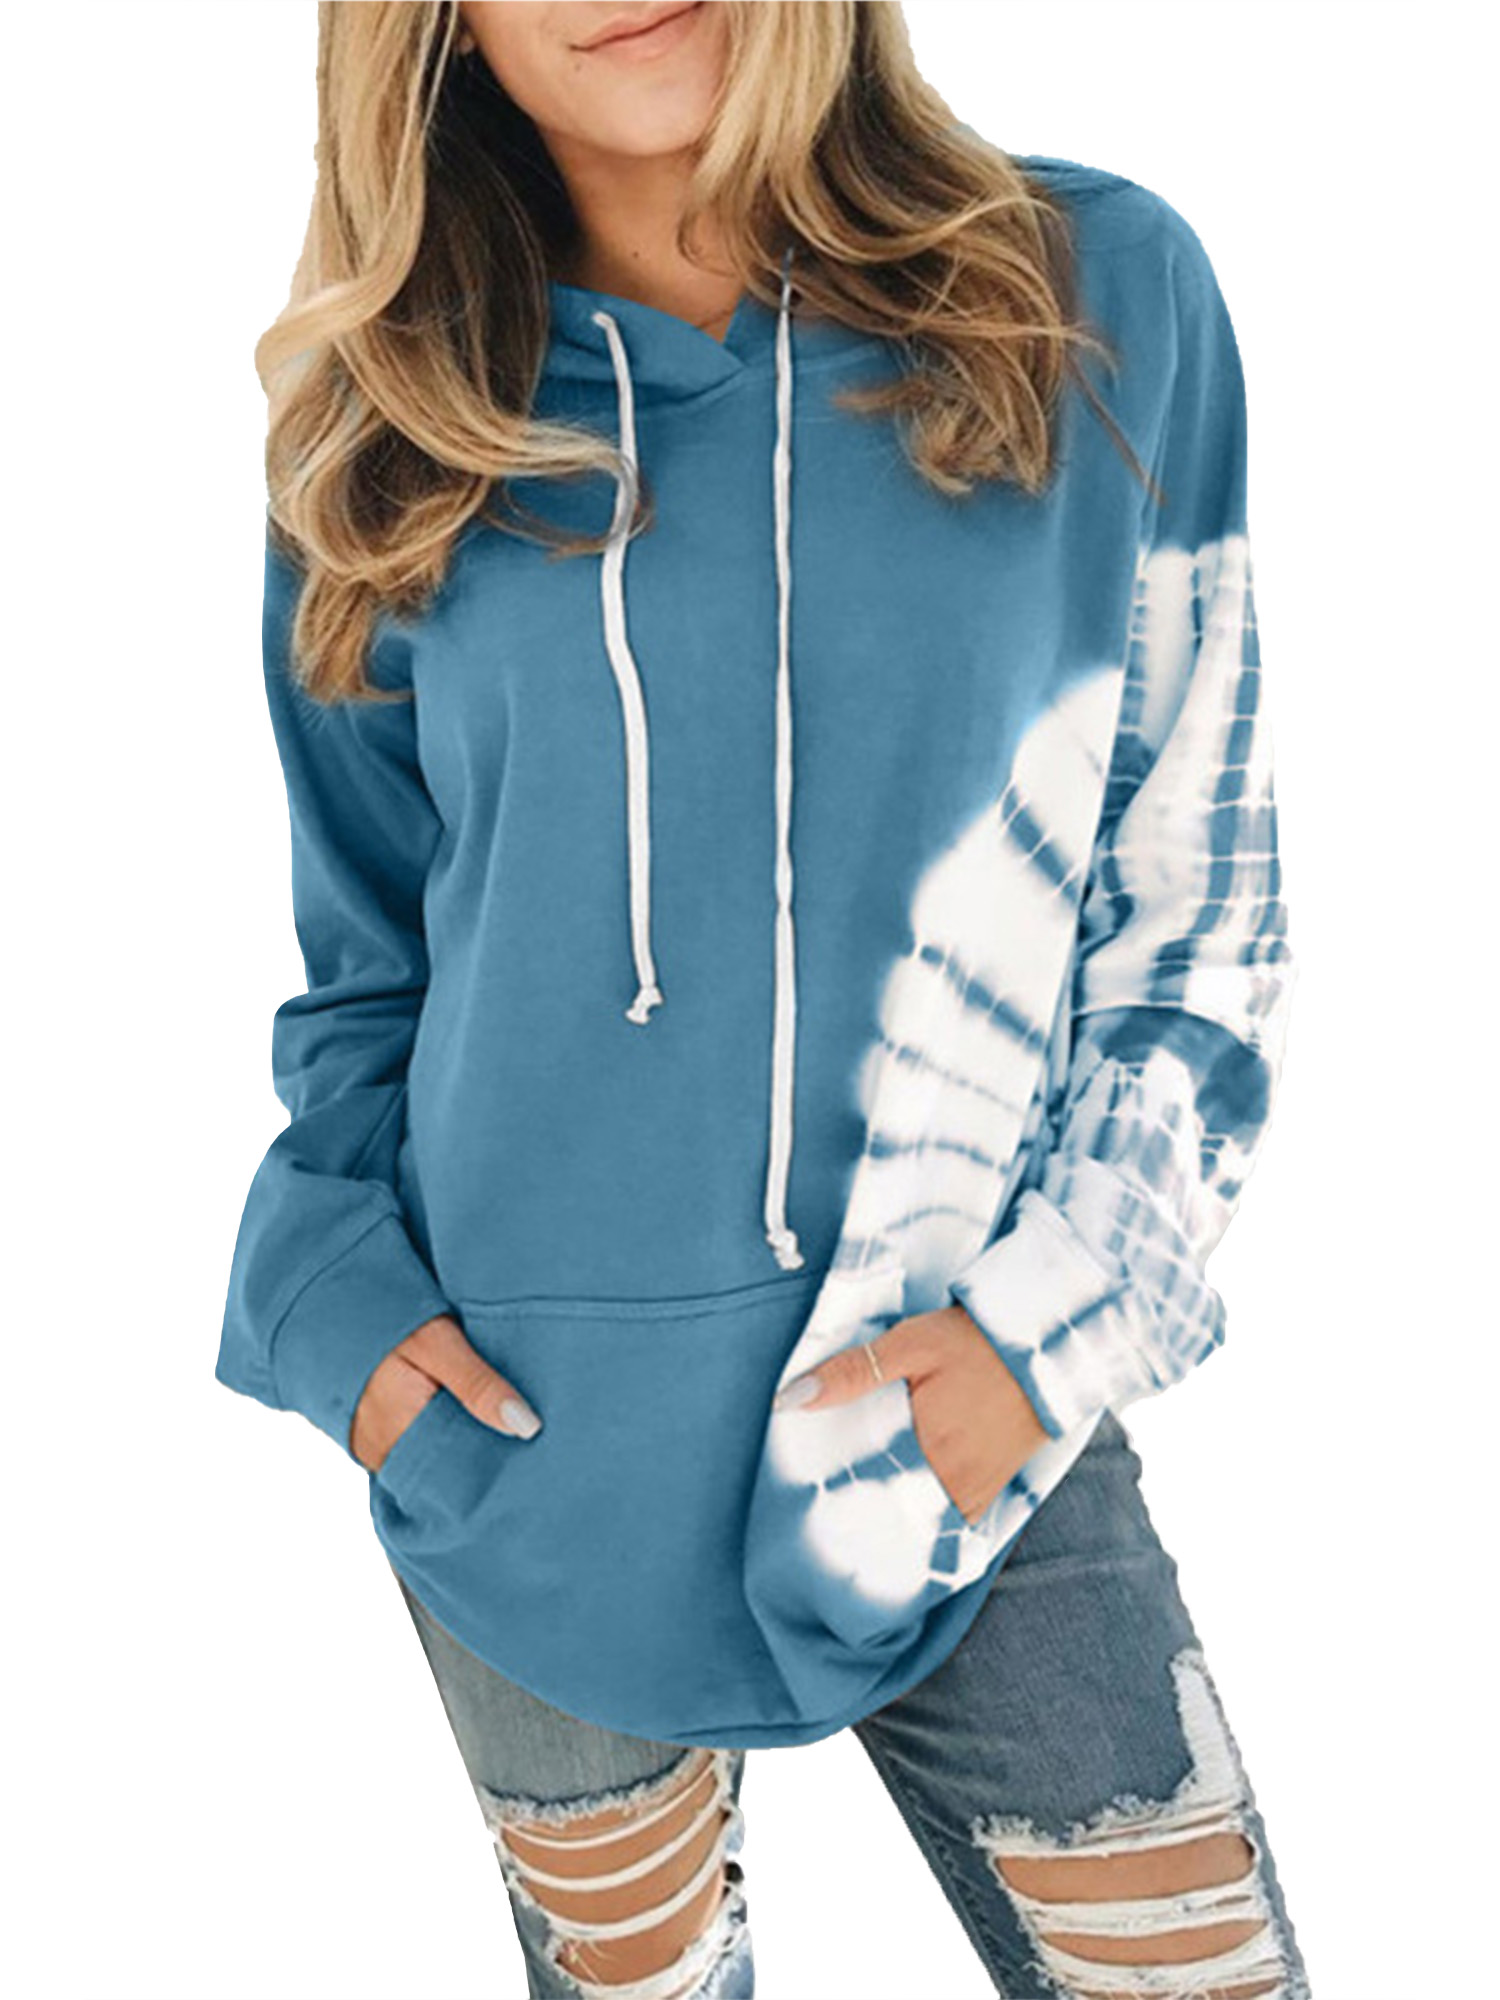 Womens Winter Fleece Hoodies Sweatshirt Hooded Jumper Pullover Loose Tunic Tops